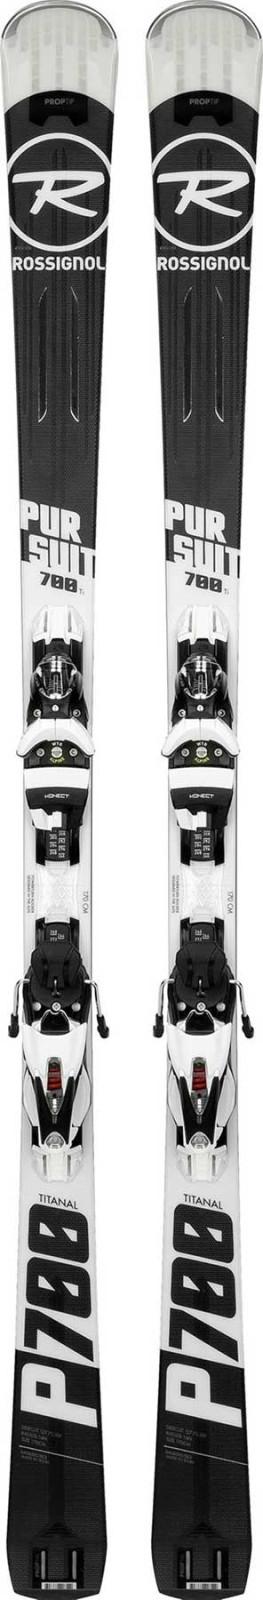 Rossignol Pursuit 700 Ti Konect + SPX 12 Konect Dual